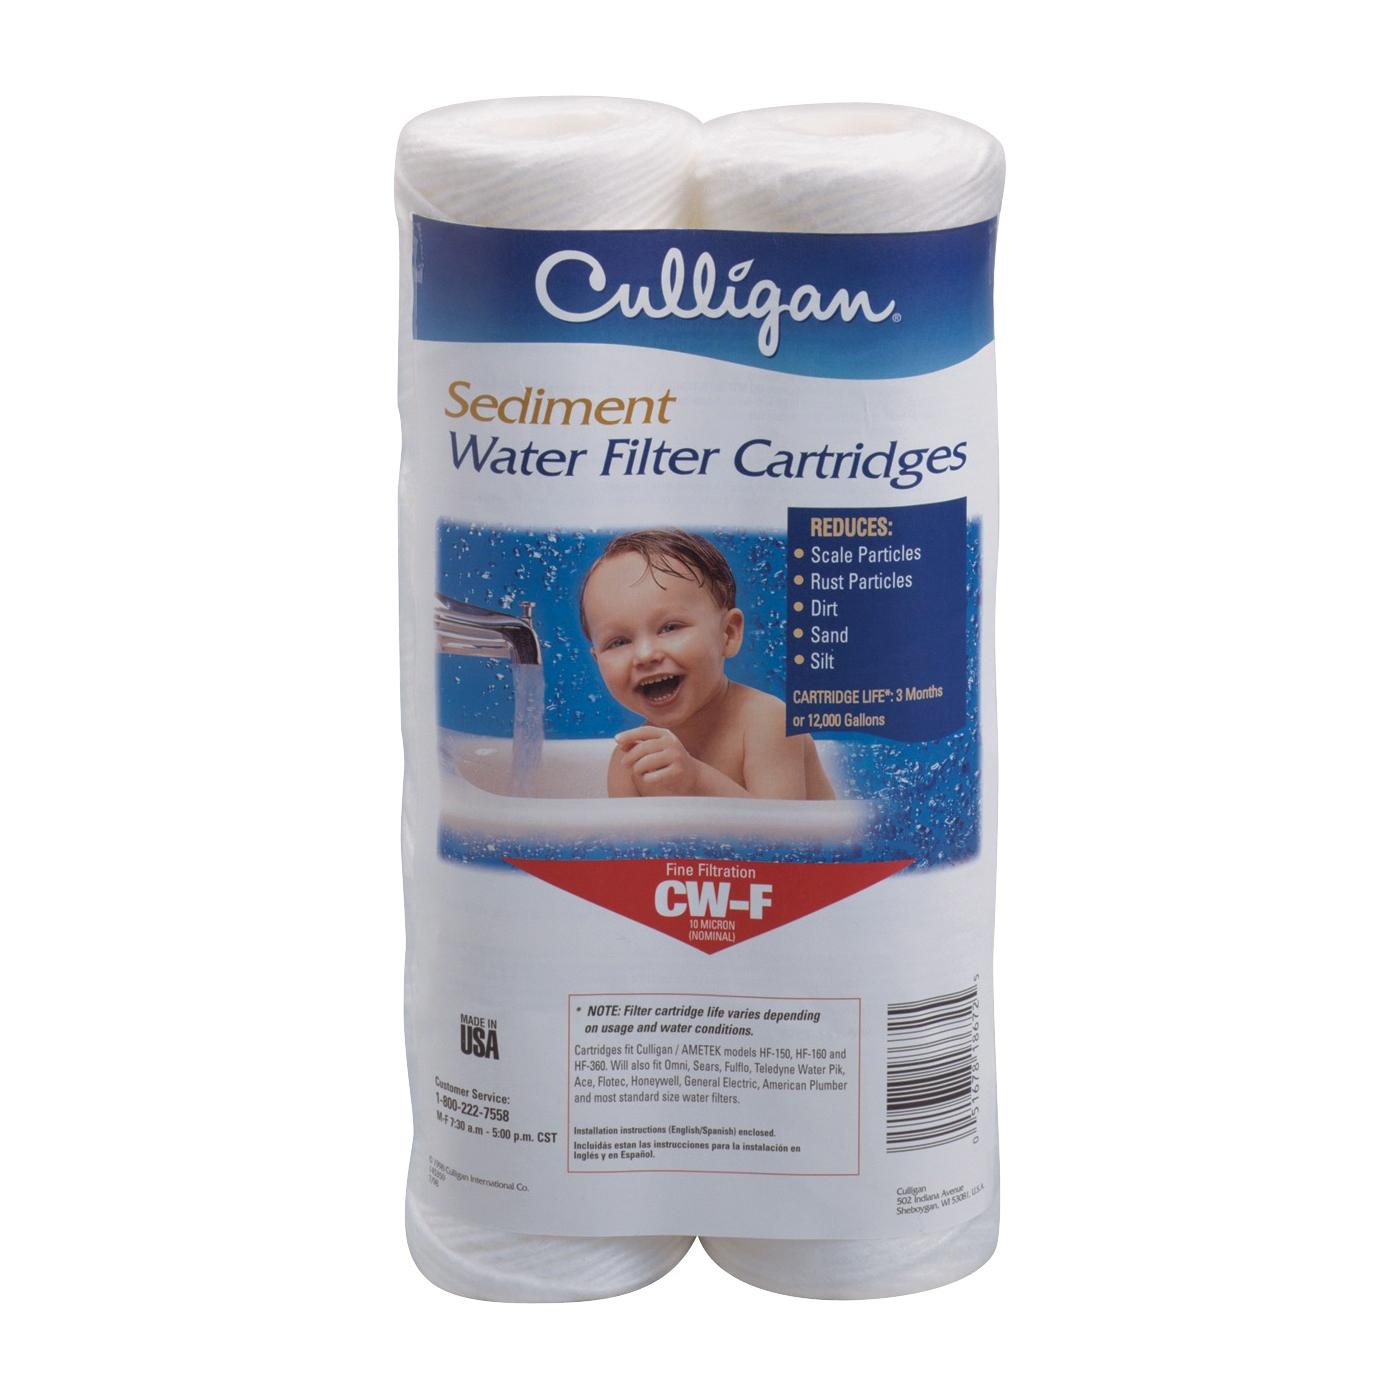 Picture of Culligan CW-F Water Filter Cartridge, 10 um Filter, Polypropylene Wound Filter Media